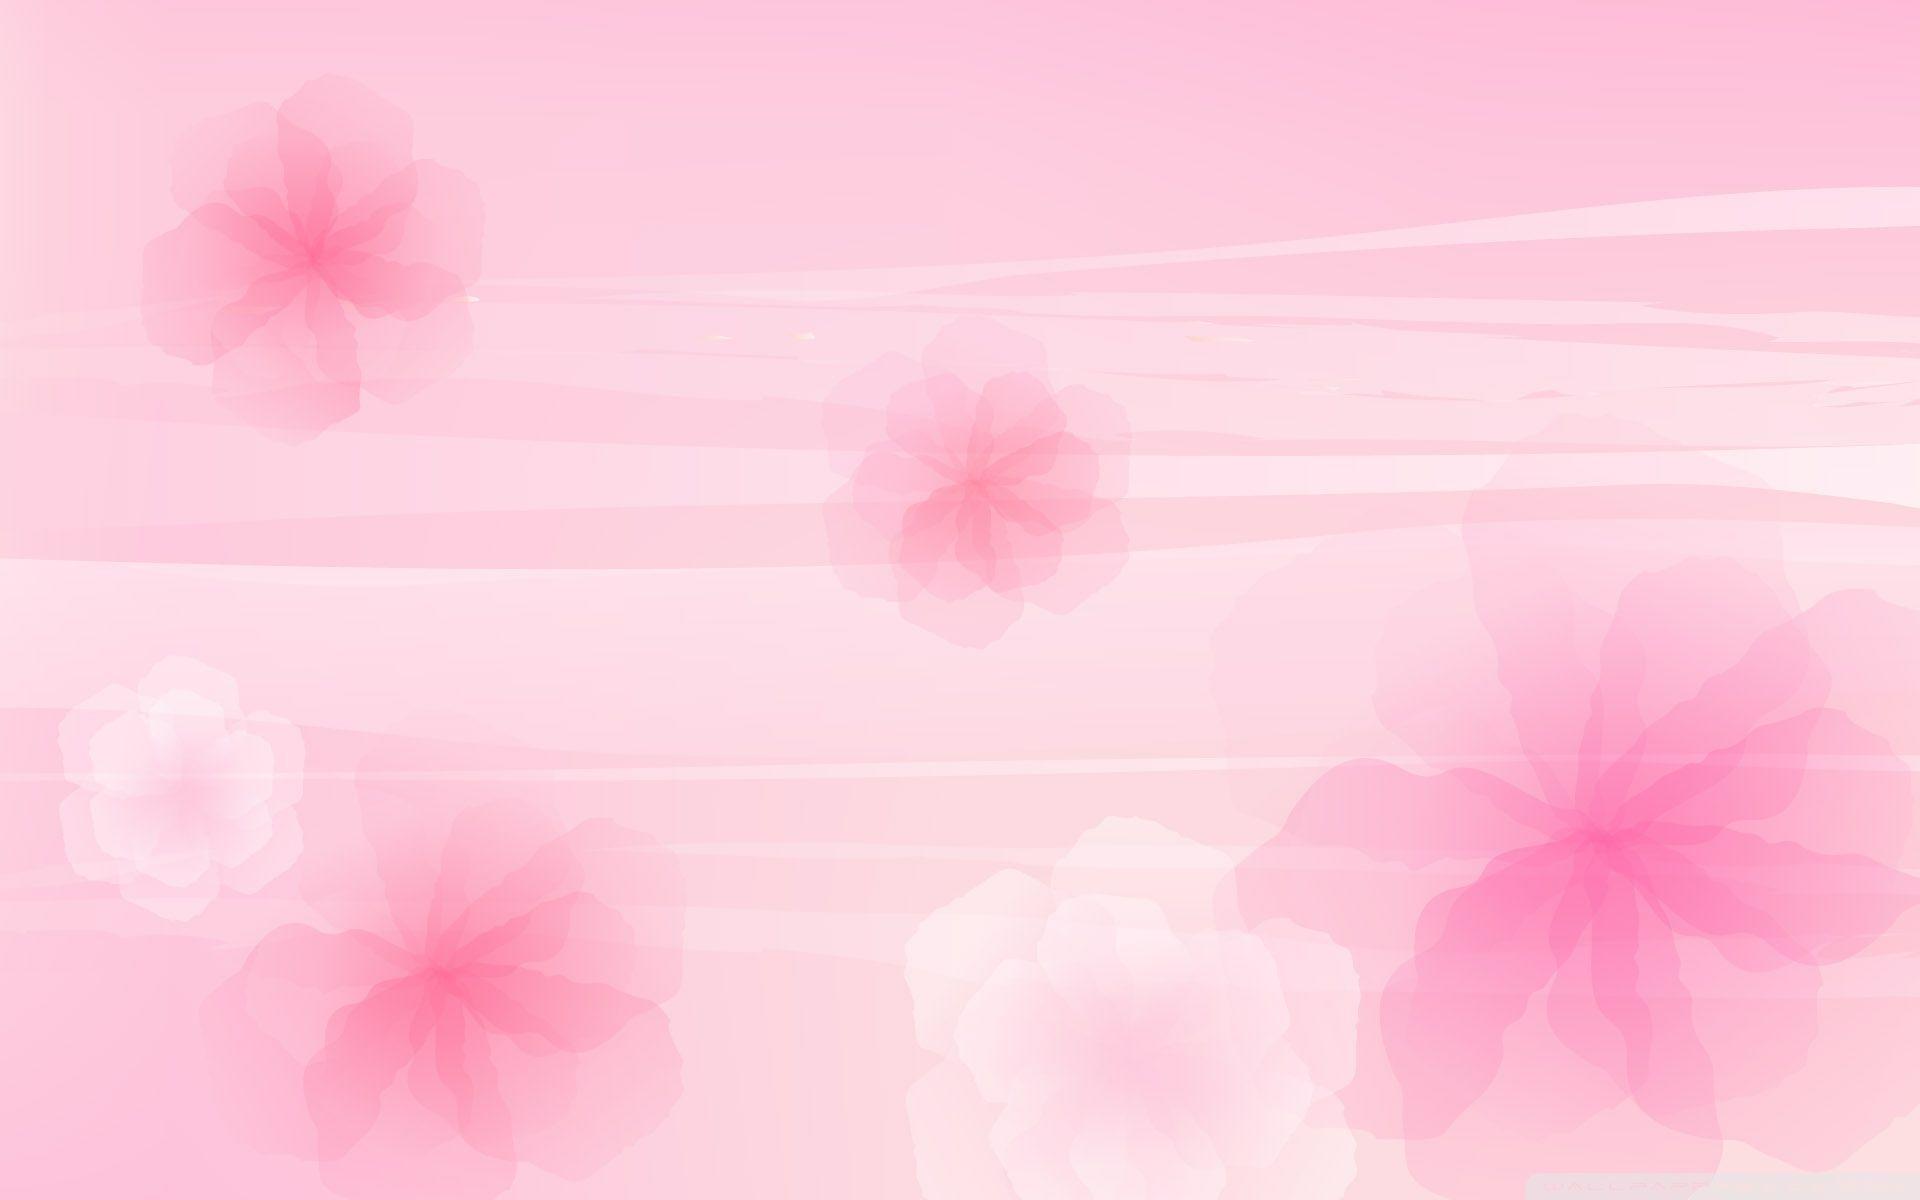 Pink Background Designs WallPaper HD